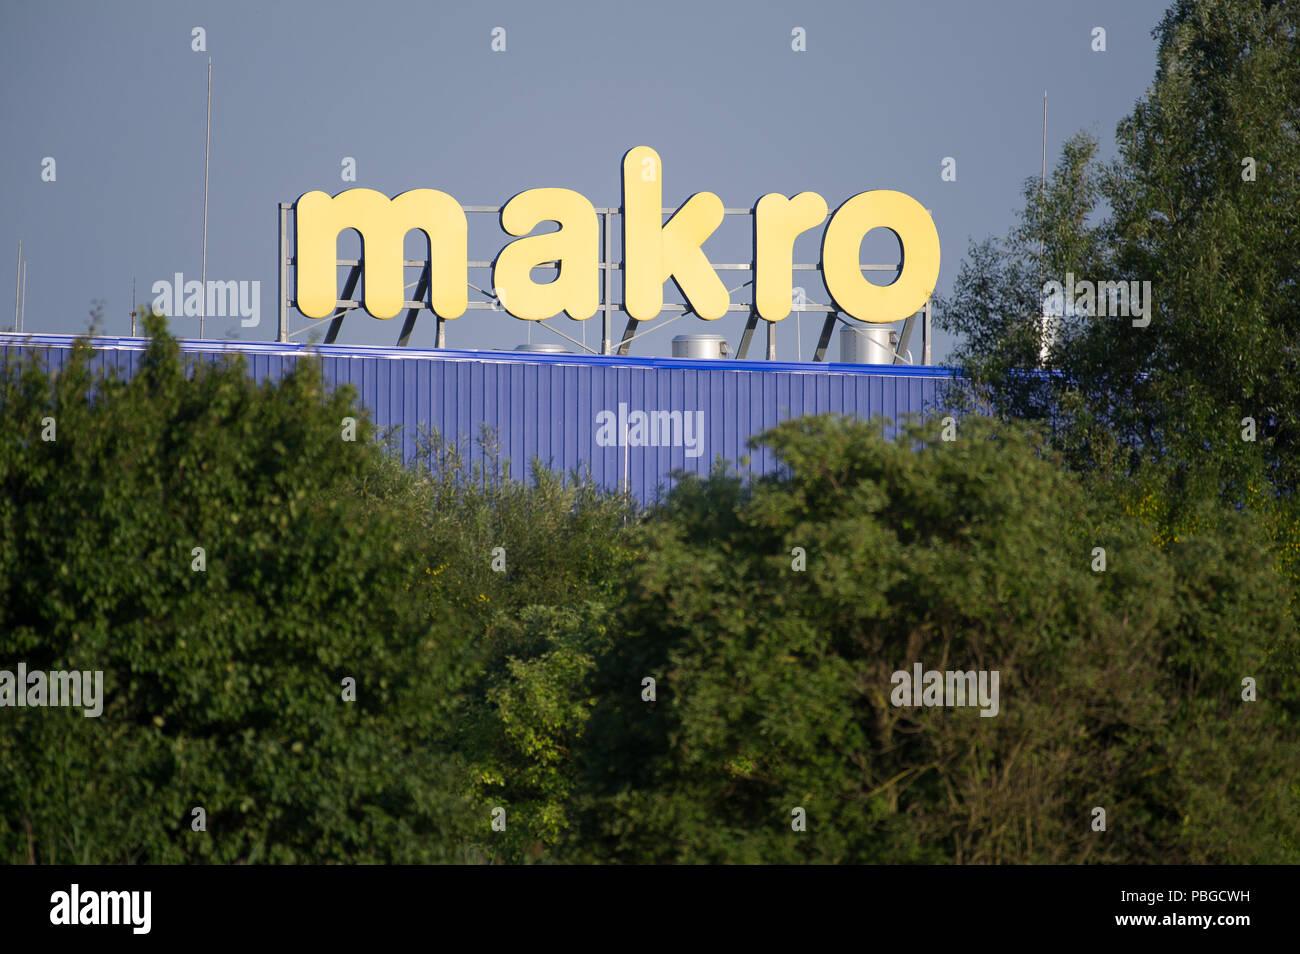 Makro Metro Cash and Carry in Gdansk, Poland. July 22nd 2018 © Wojciech Strozyk / Alamy Stock Photo - Stock Image